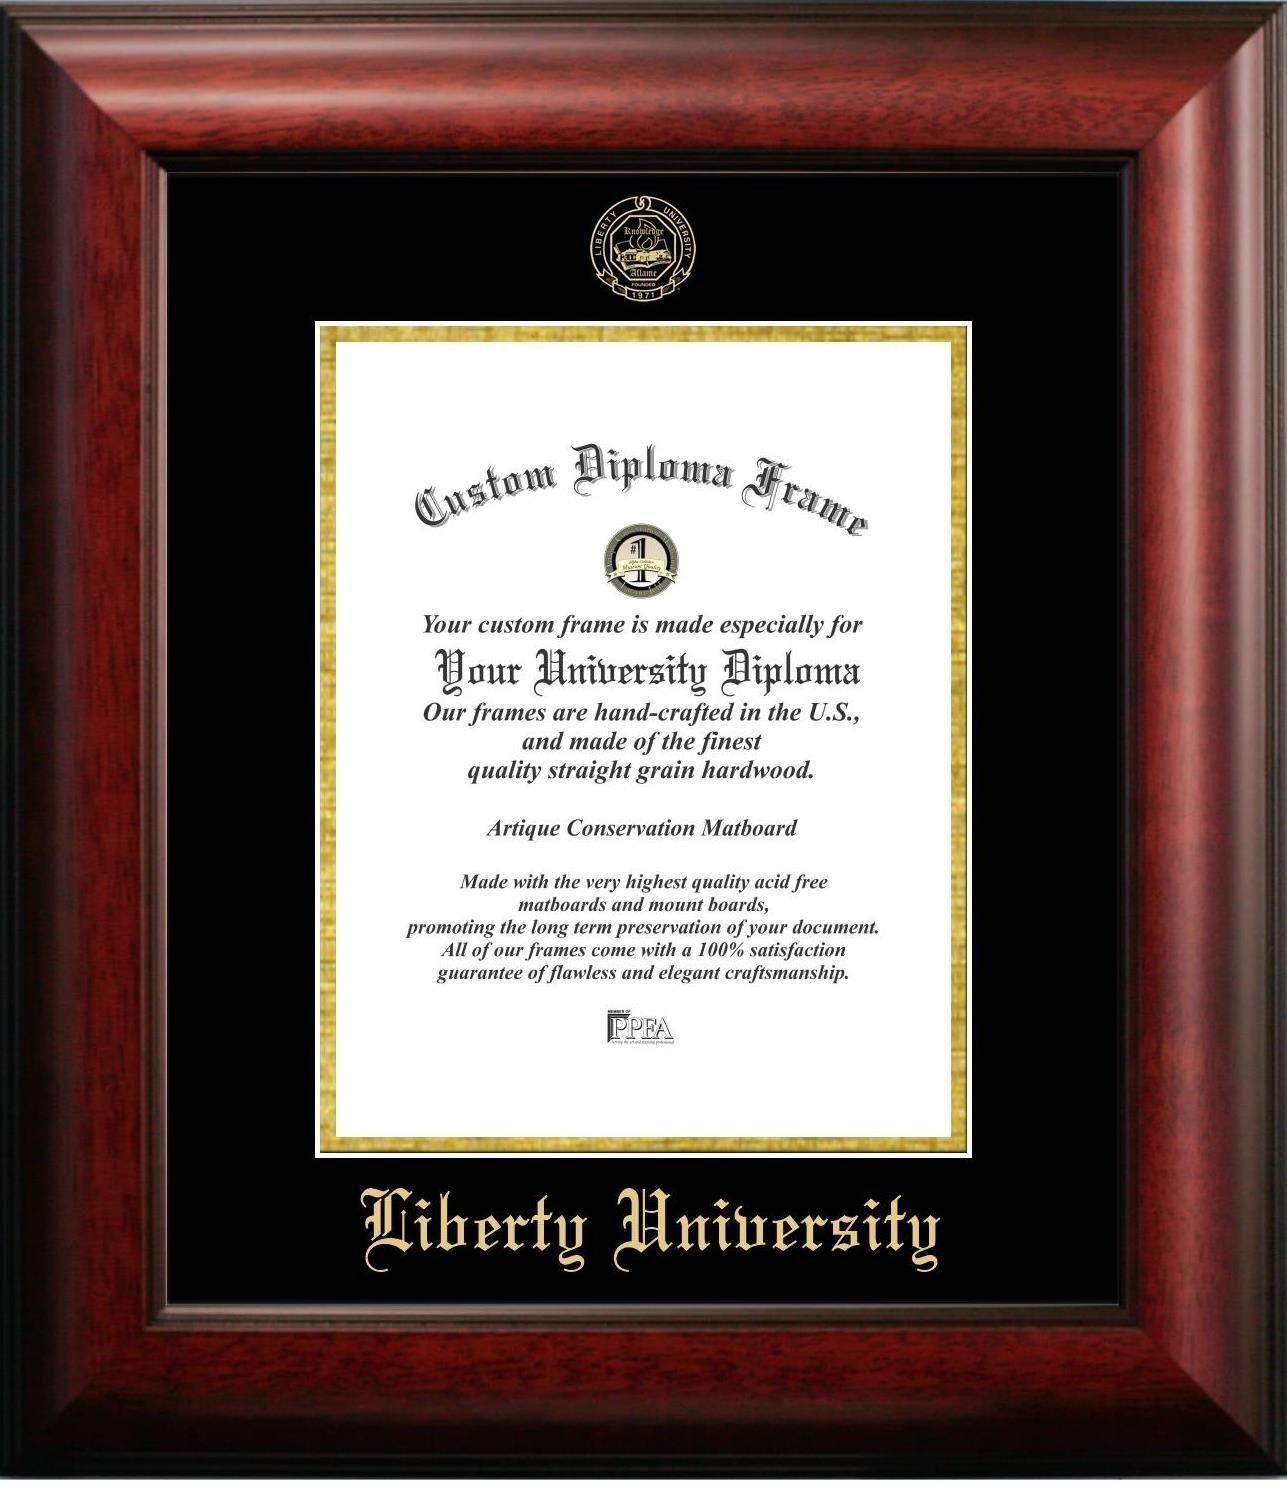 Amazon.com - Liberty University Graduation Diploma Frame (14 x 17) -